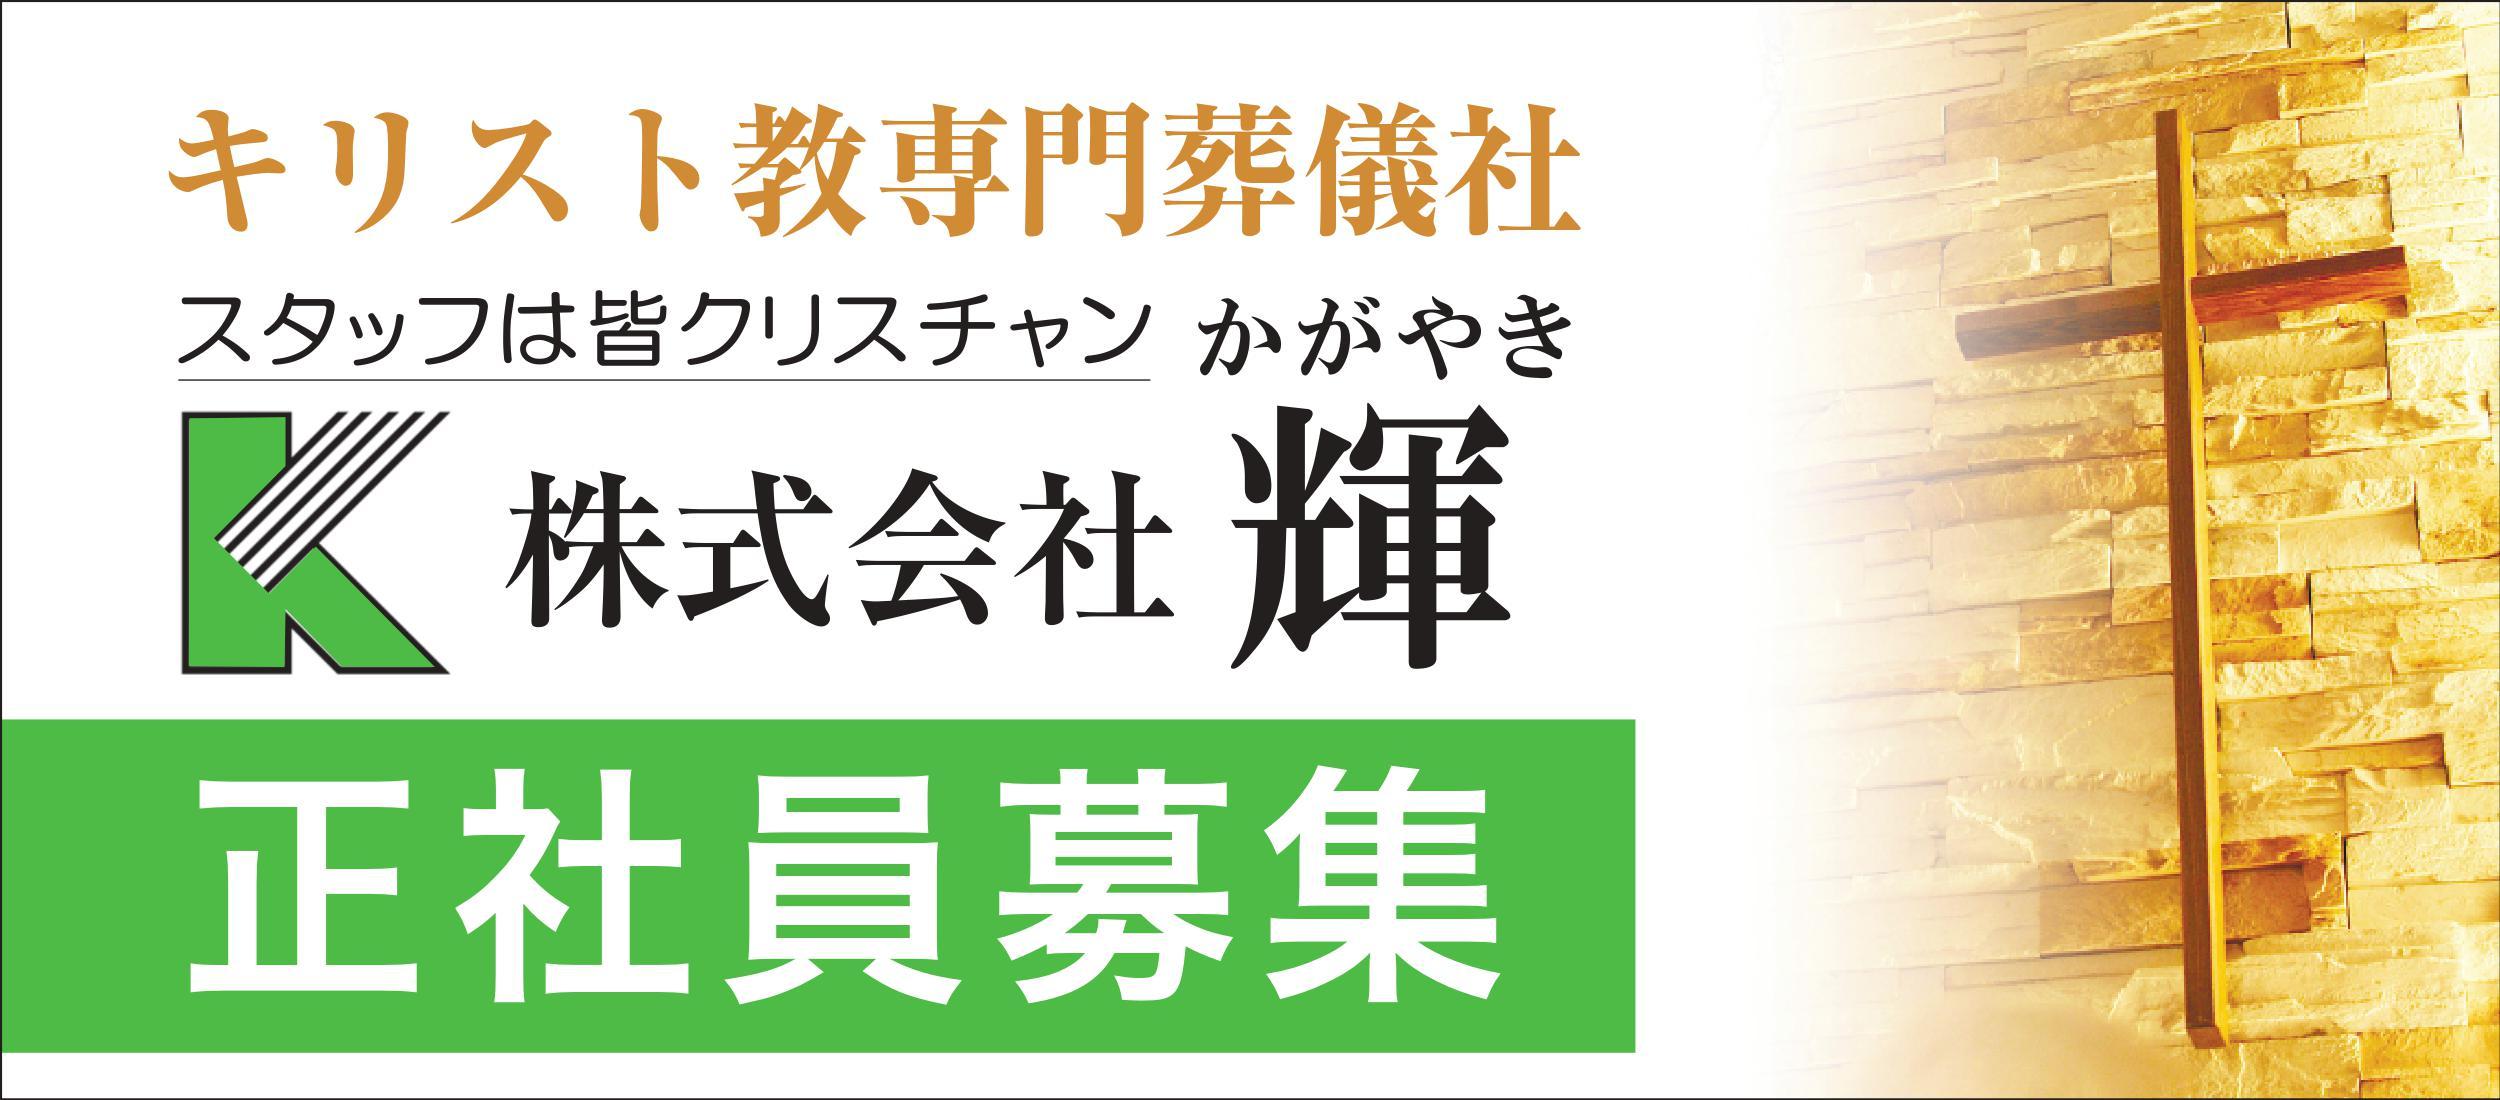 http://cfc-kagayaki.co.jp/index.html